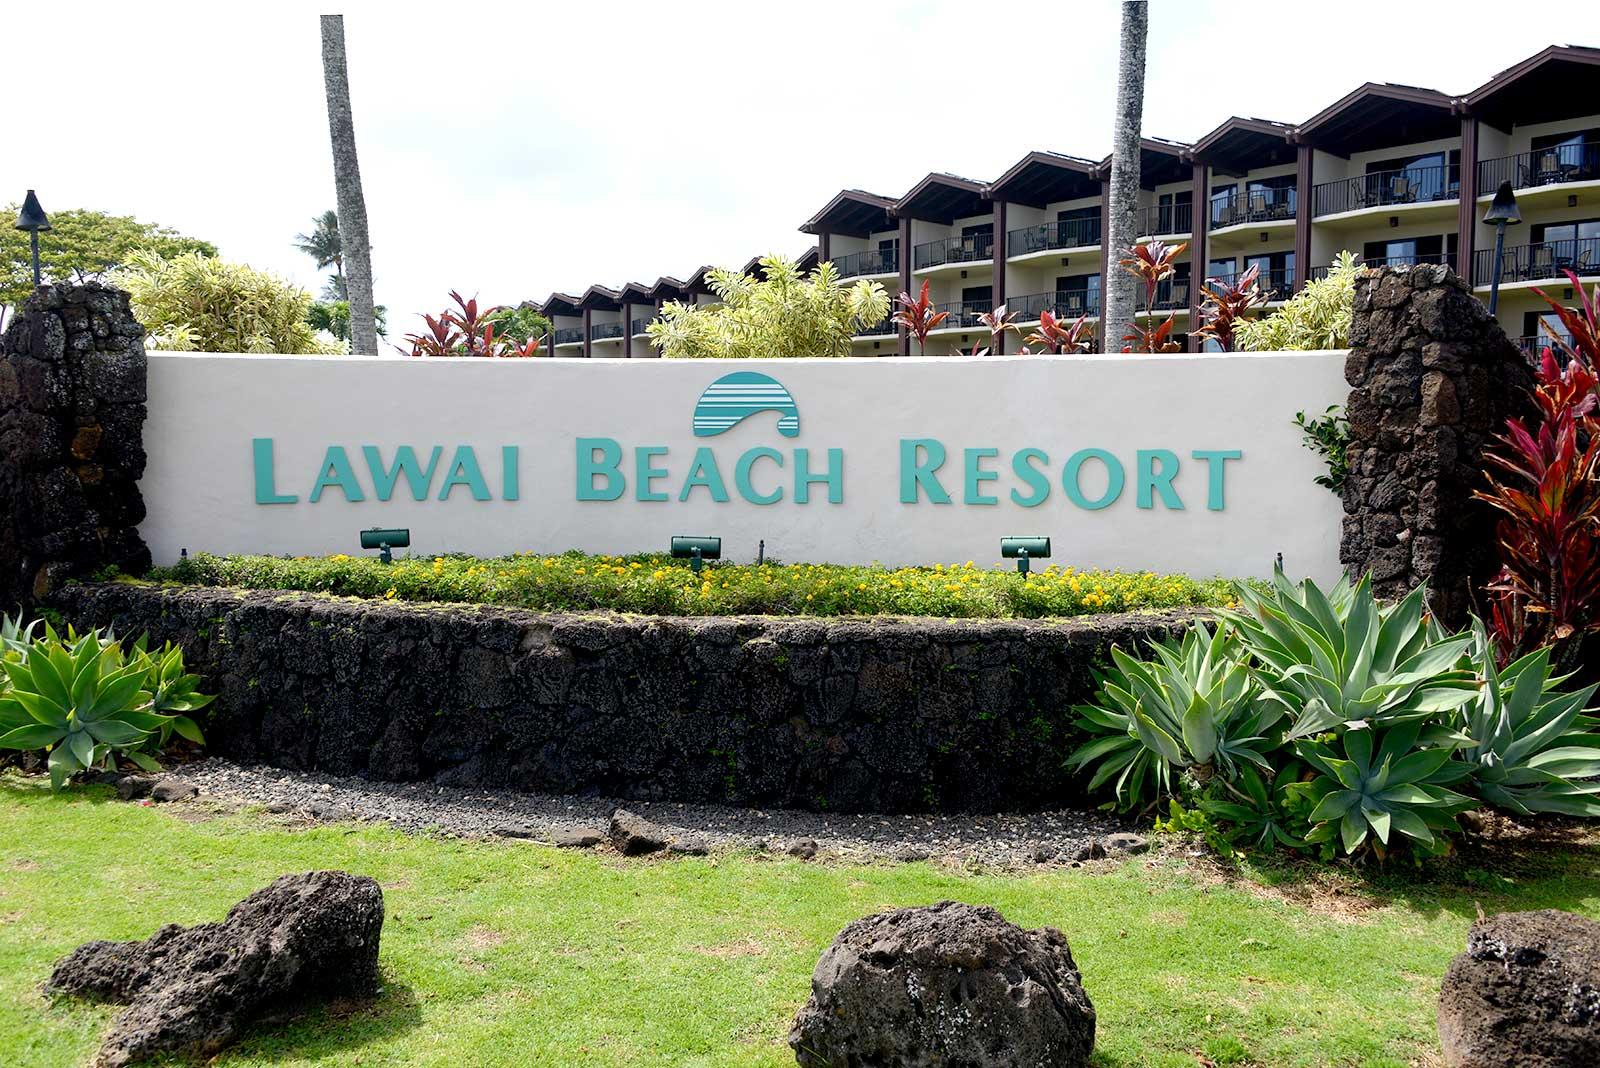 Lawai-Beach-Resort-Kauai-16